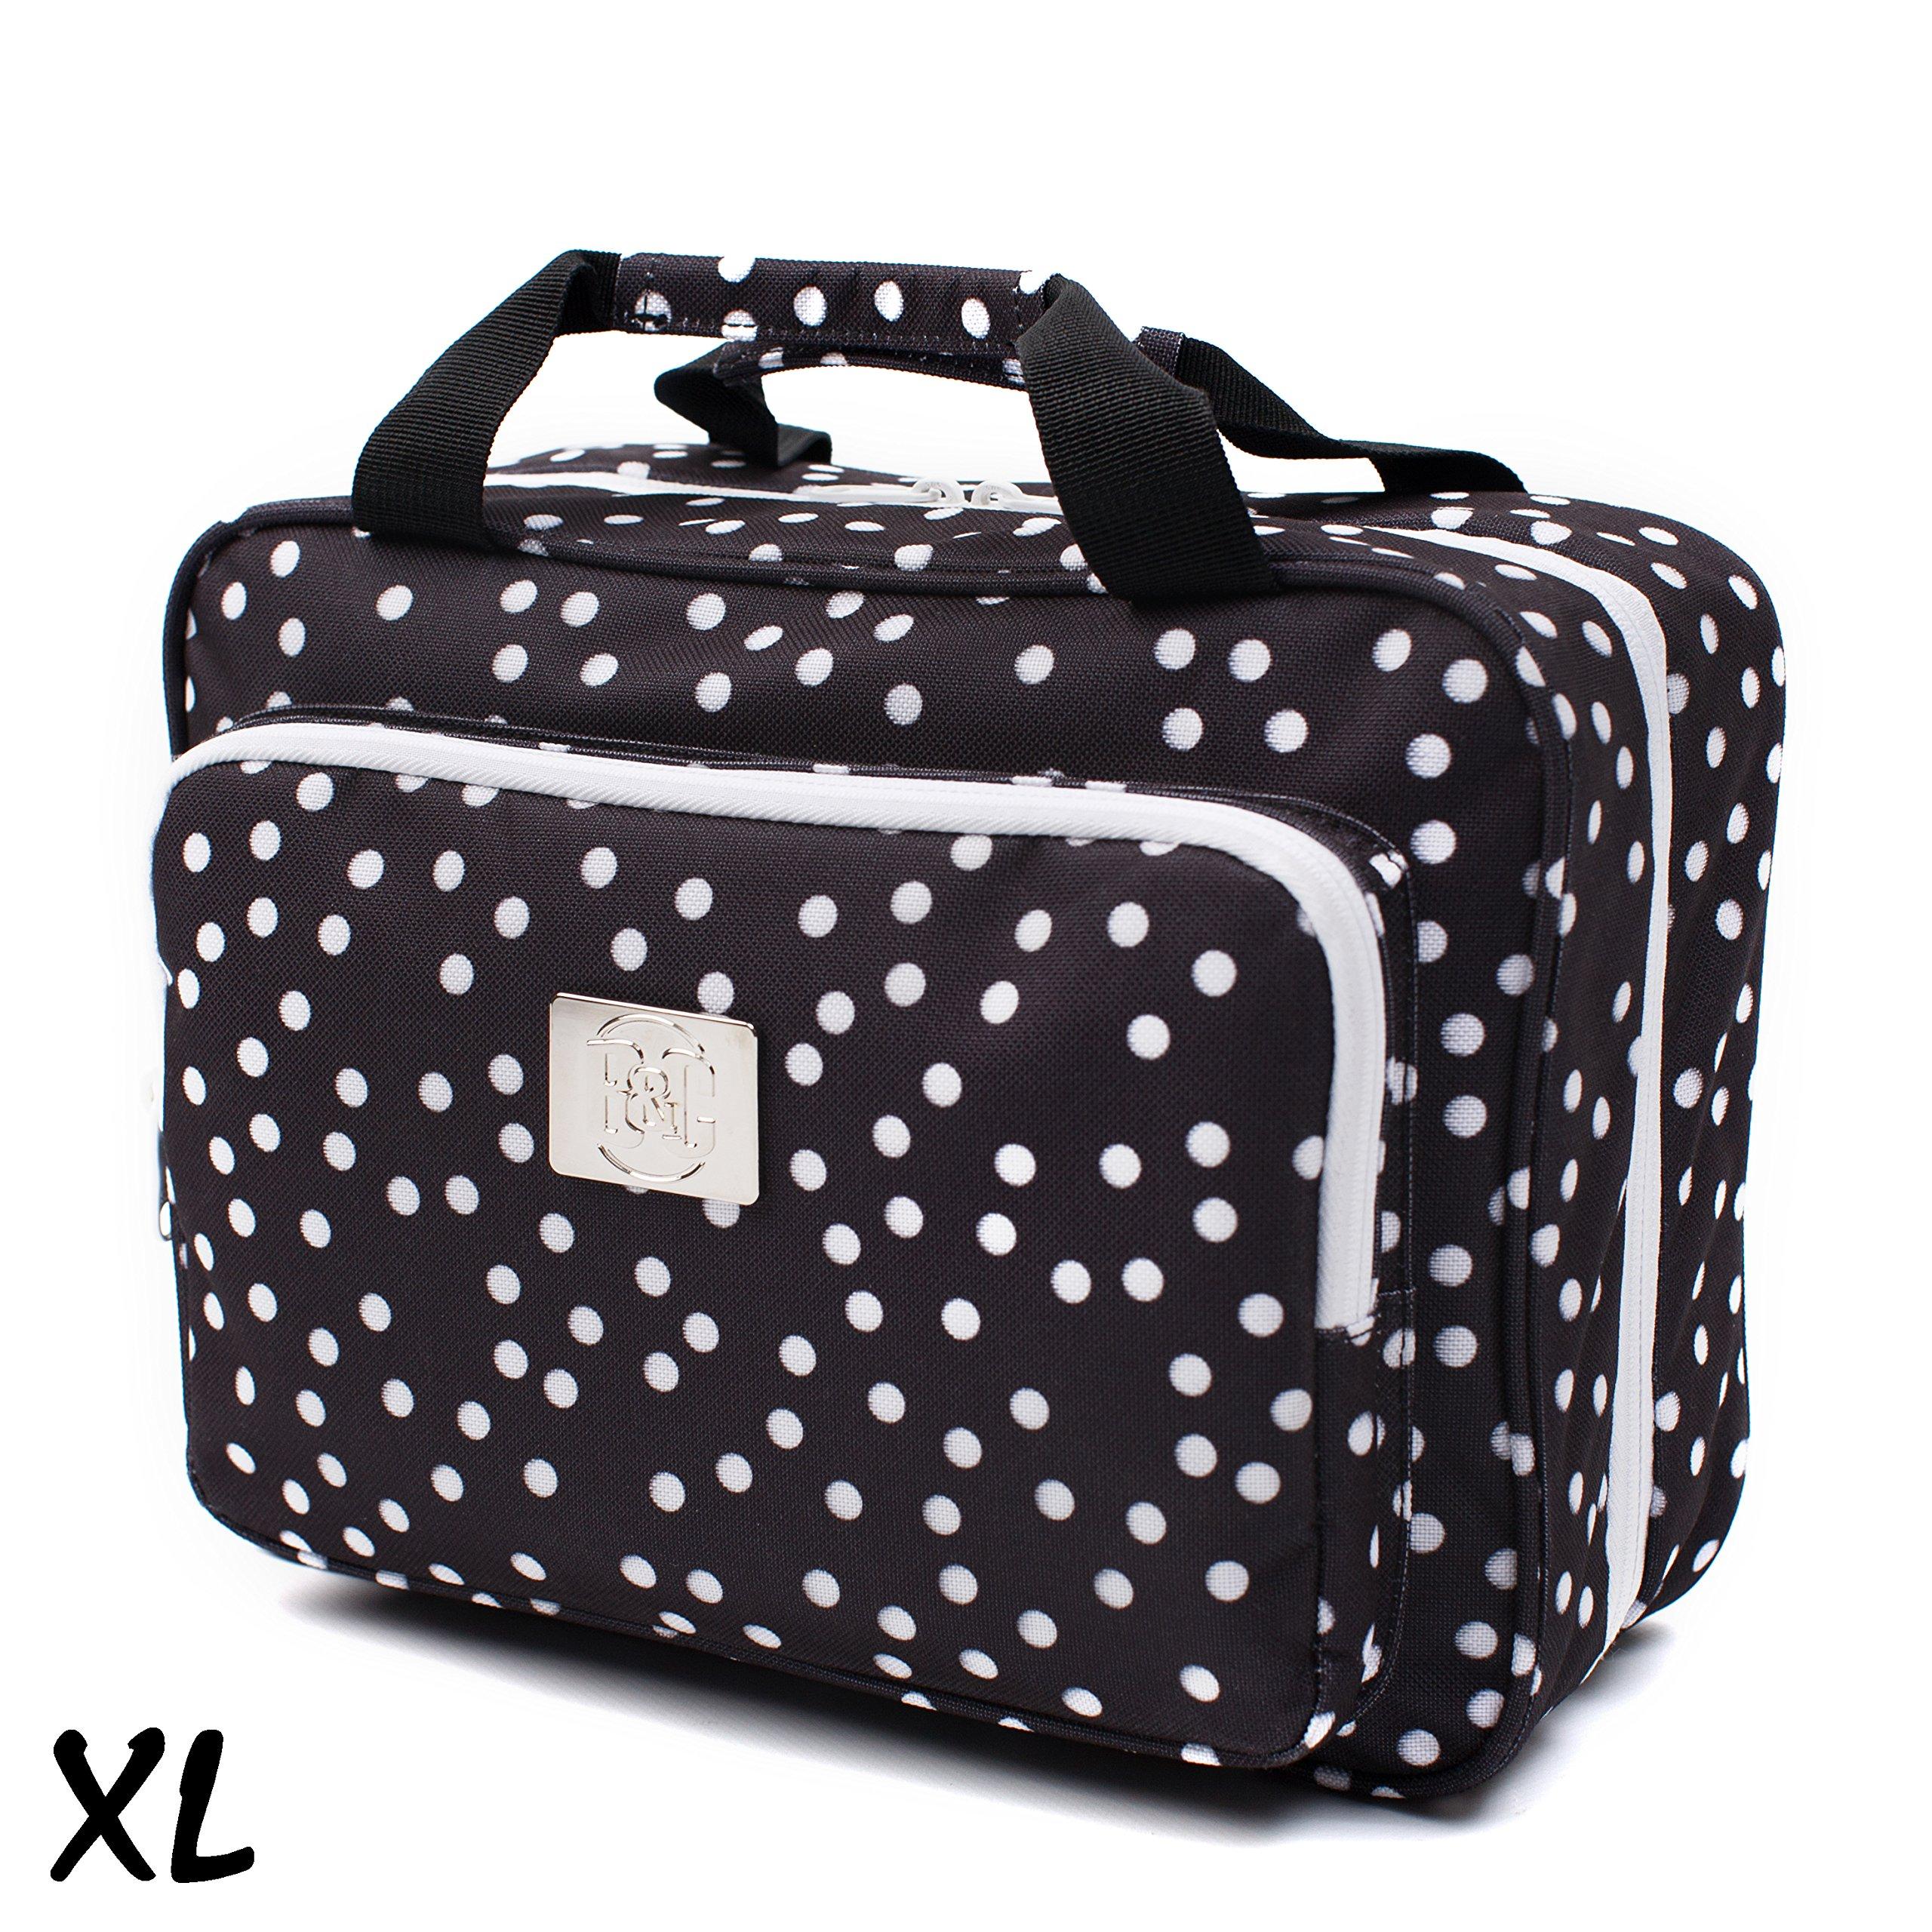 ceb37e008cd4 Amazon.com   Large Versatile Travel Cosmetic Bag - Perfect Hanging Travel  Toiletry Organizer (XL Polka dot)   Beauty